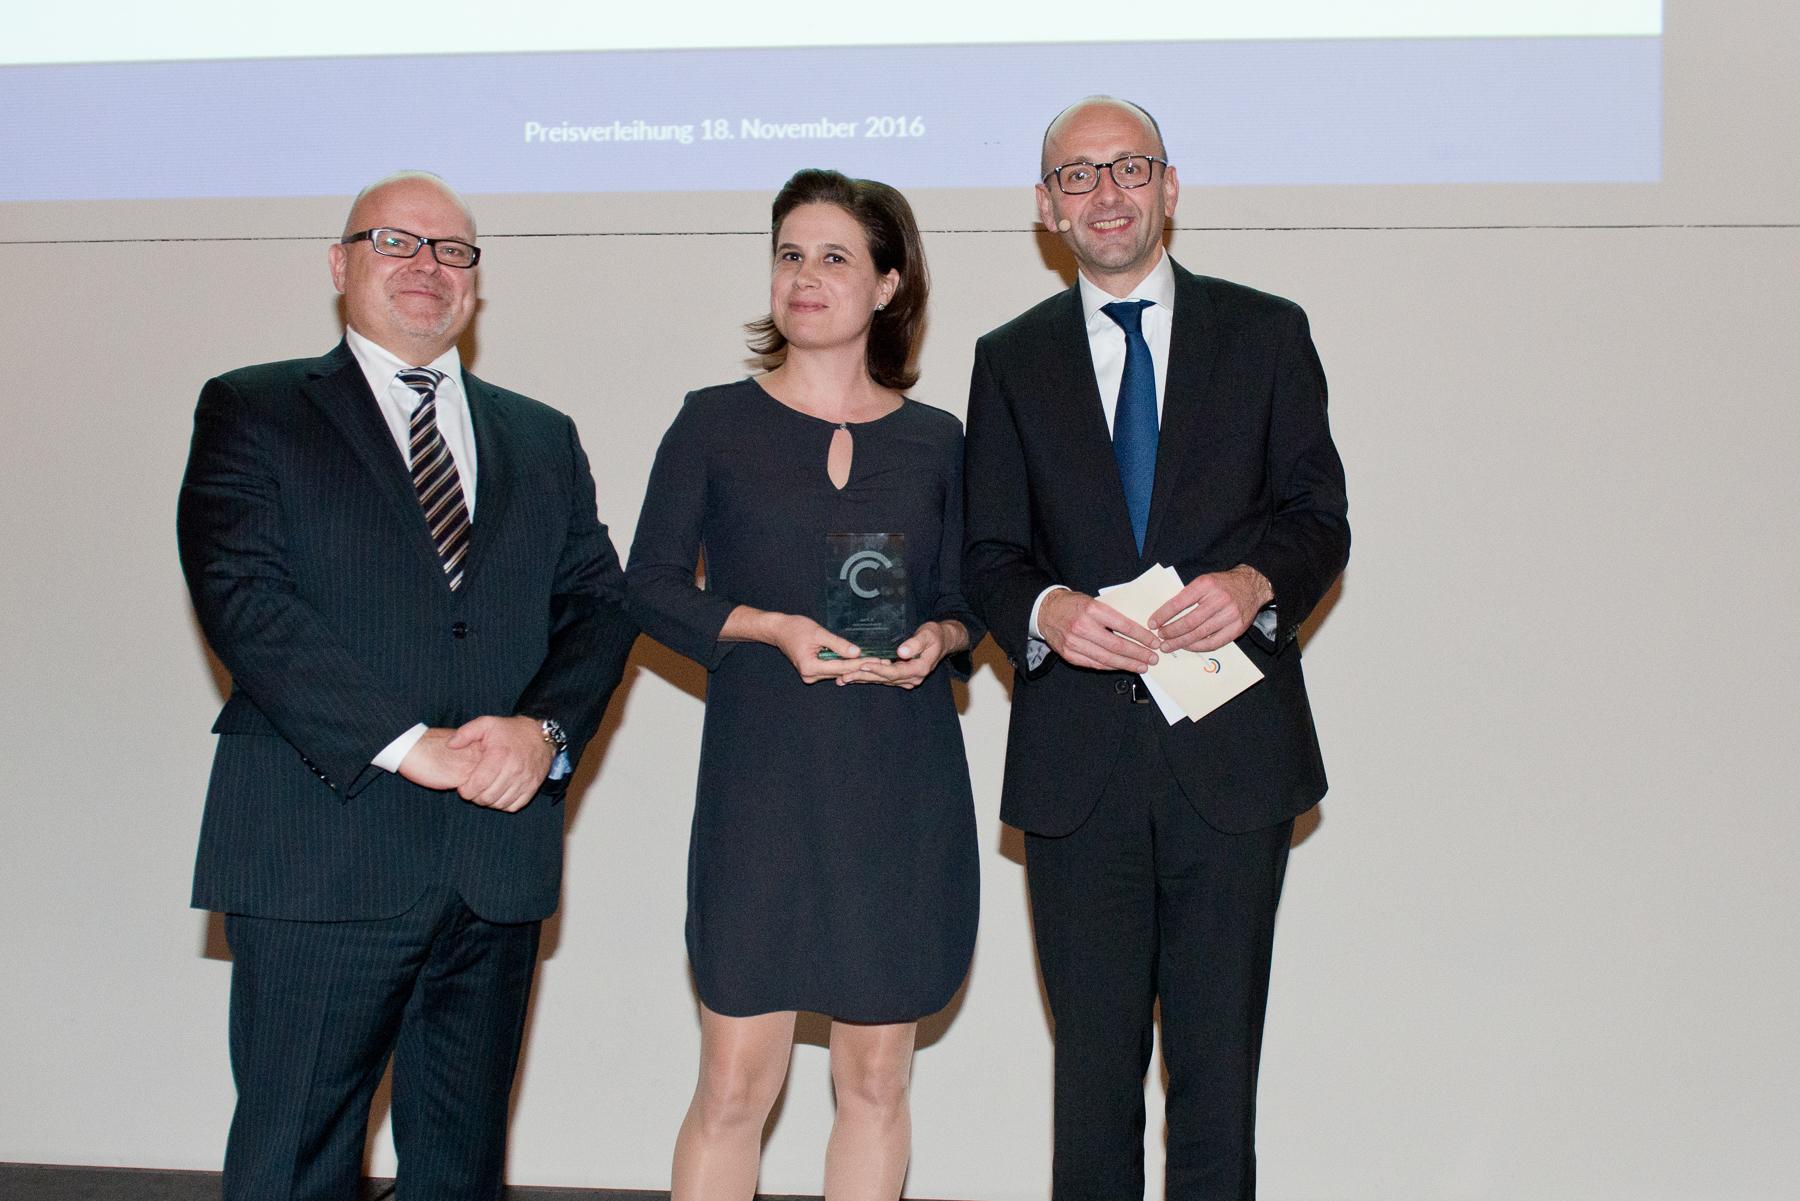 Dr Michael Jaffé, Christina Hiptmayr (3rd prize), Prof. Lucas F. Flöther